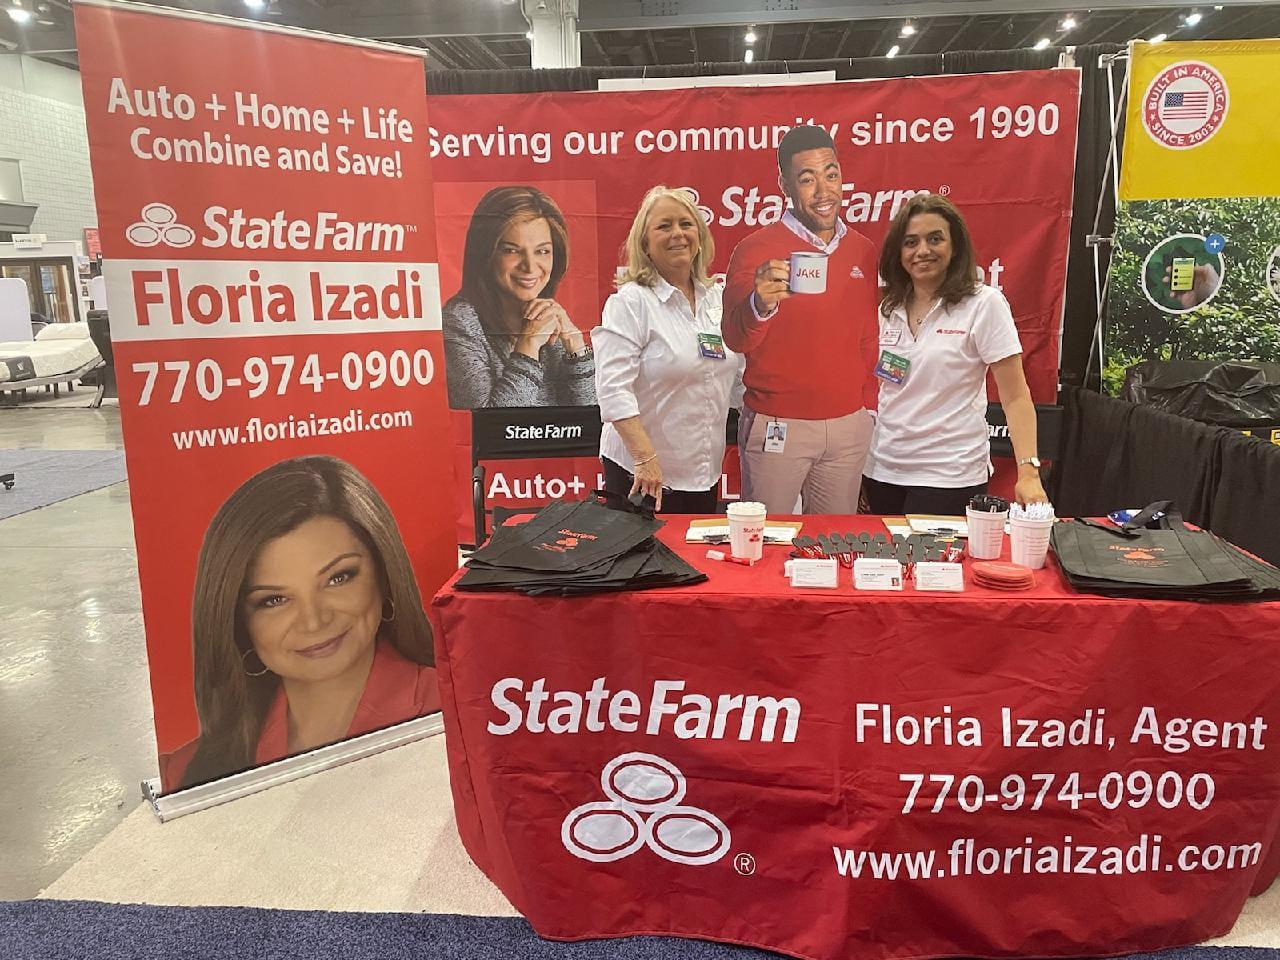 Floria Izadi - State Farm Insurance Agent